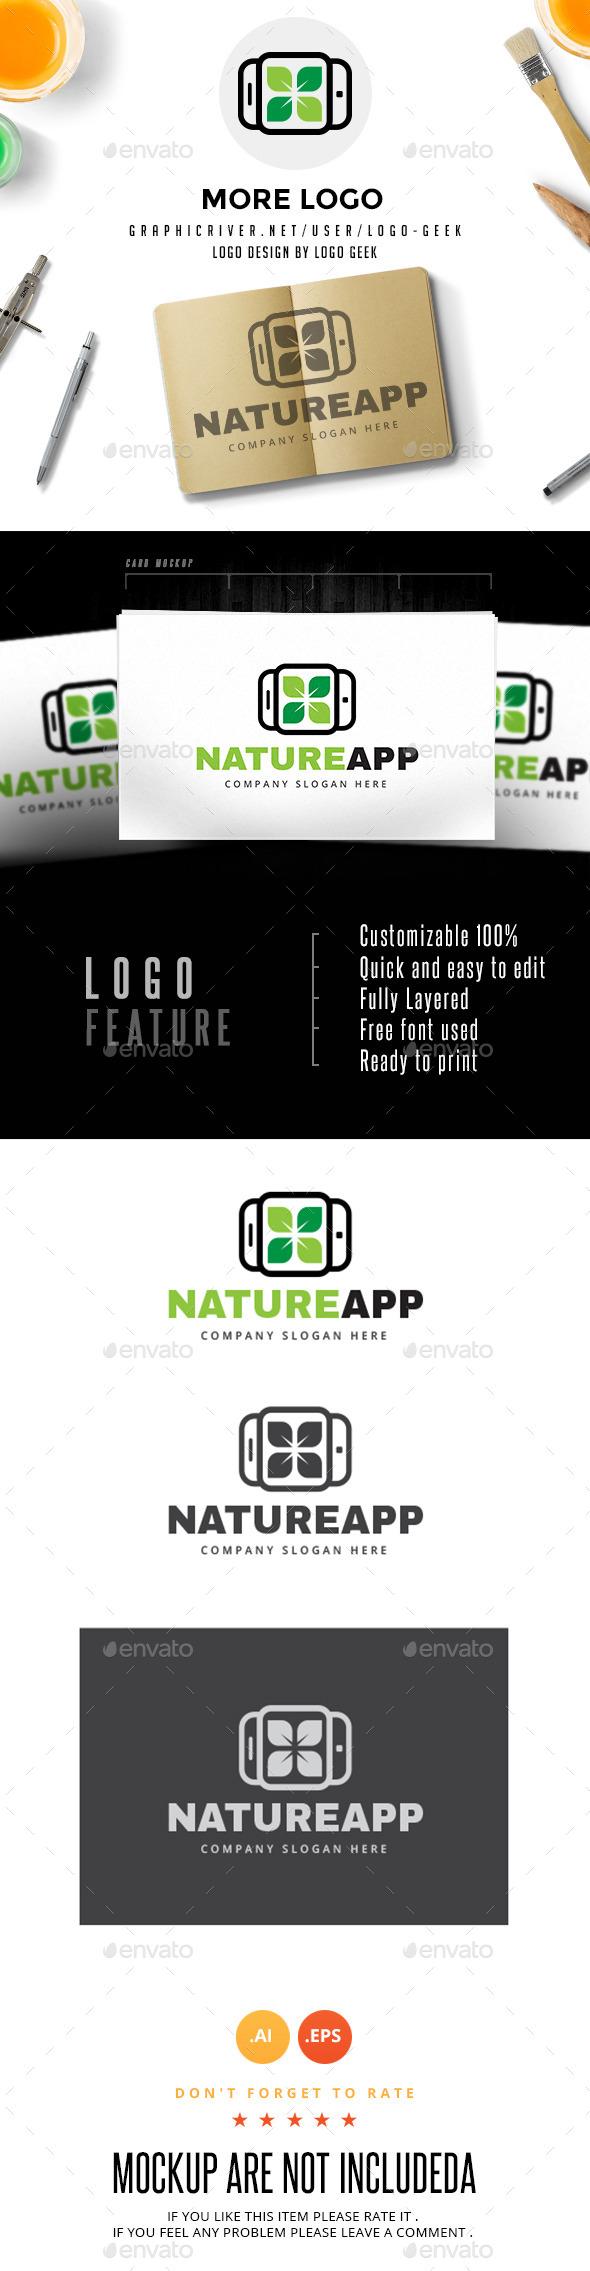 GraphicRiver Nature App 10604246